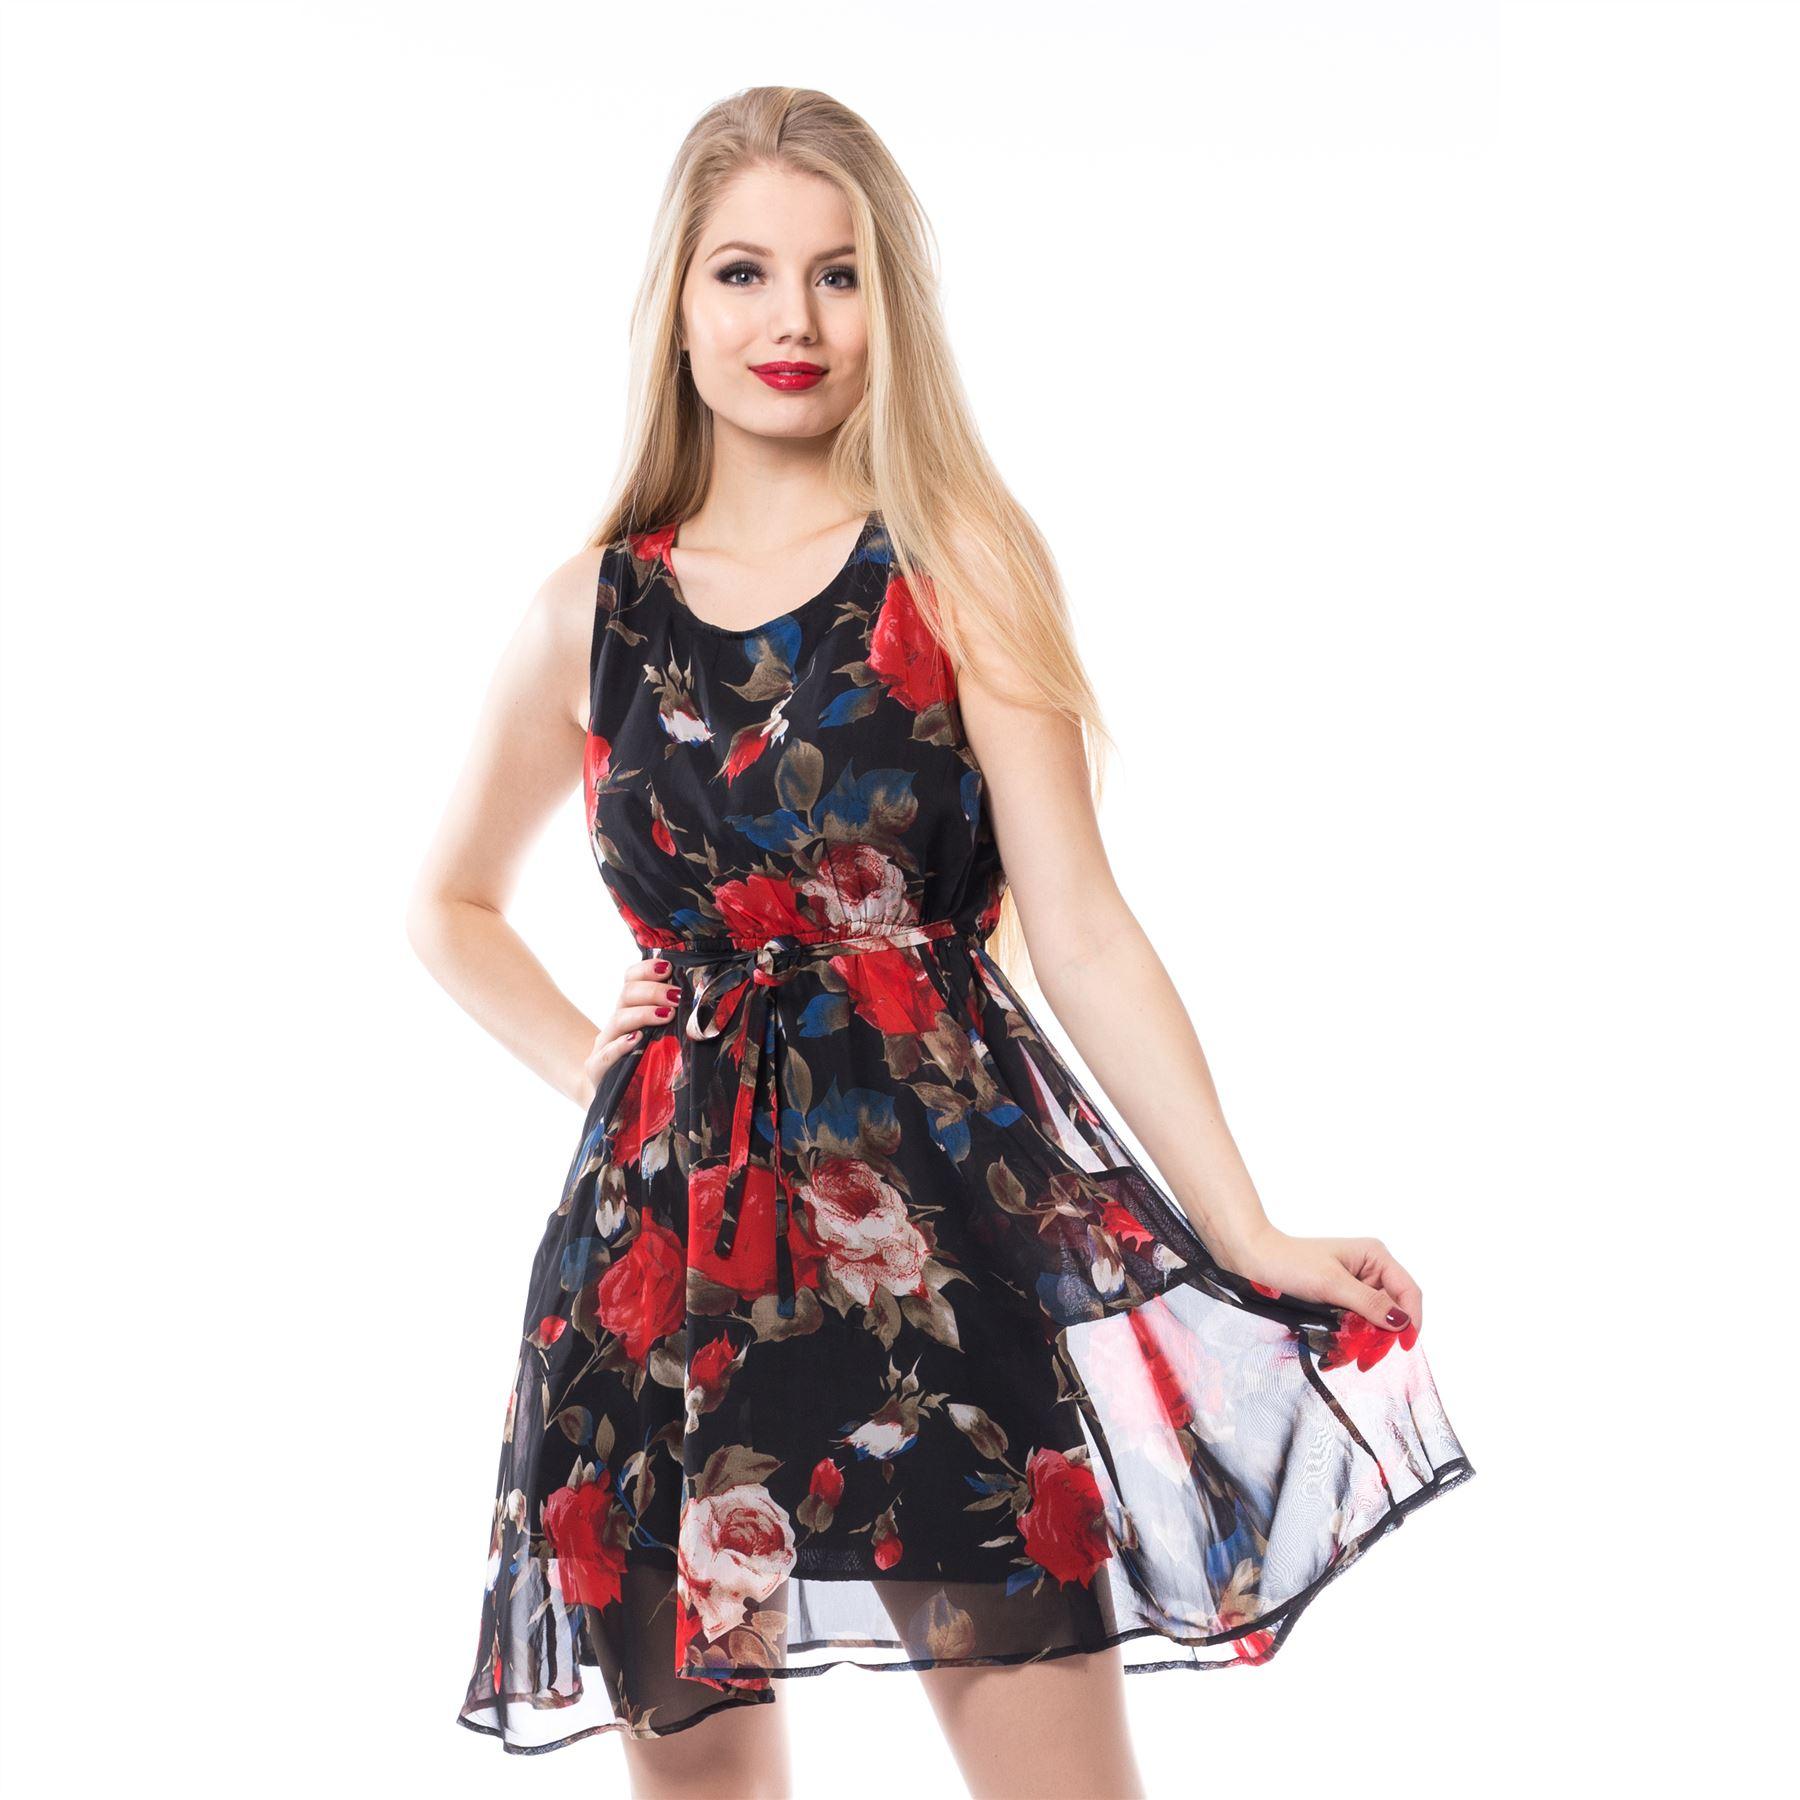 886fdc2354 Details about Innocent Lifestyle Claudia Dress Ladies Black Goth Emo Punk